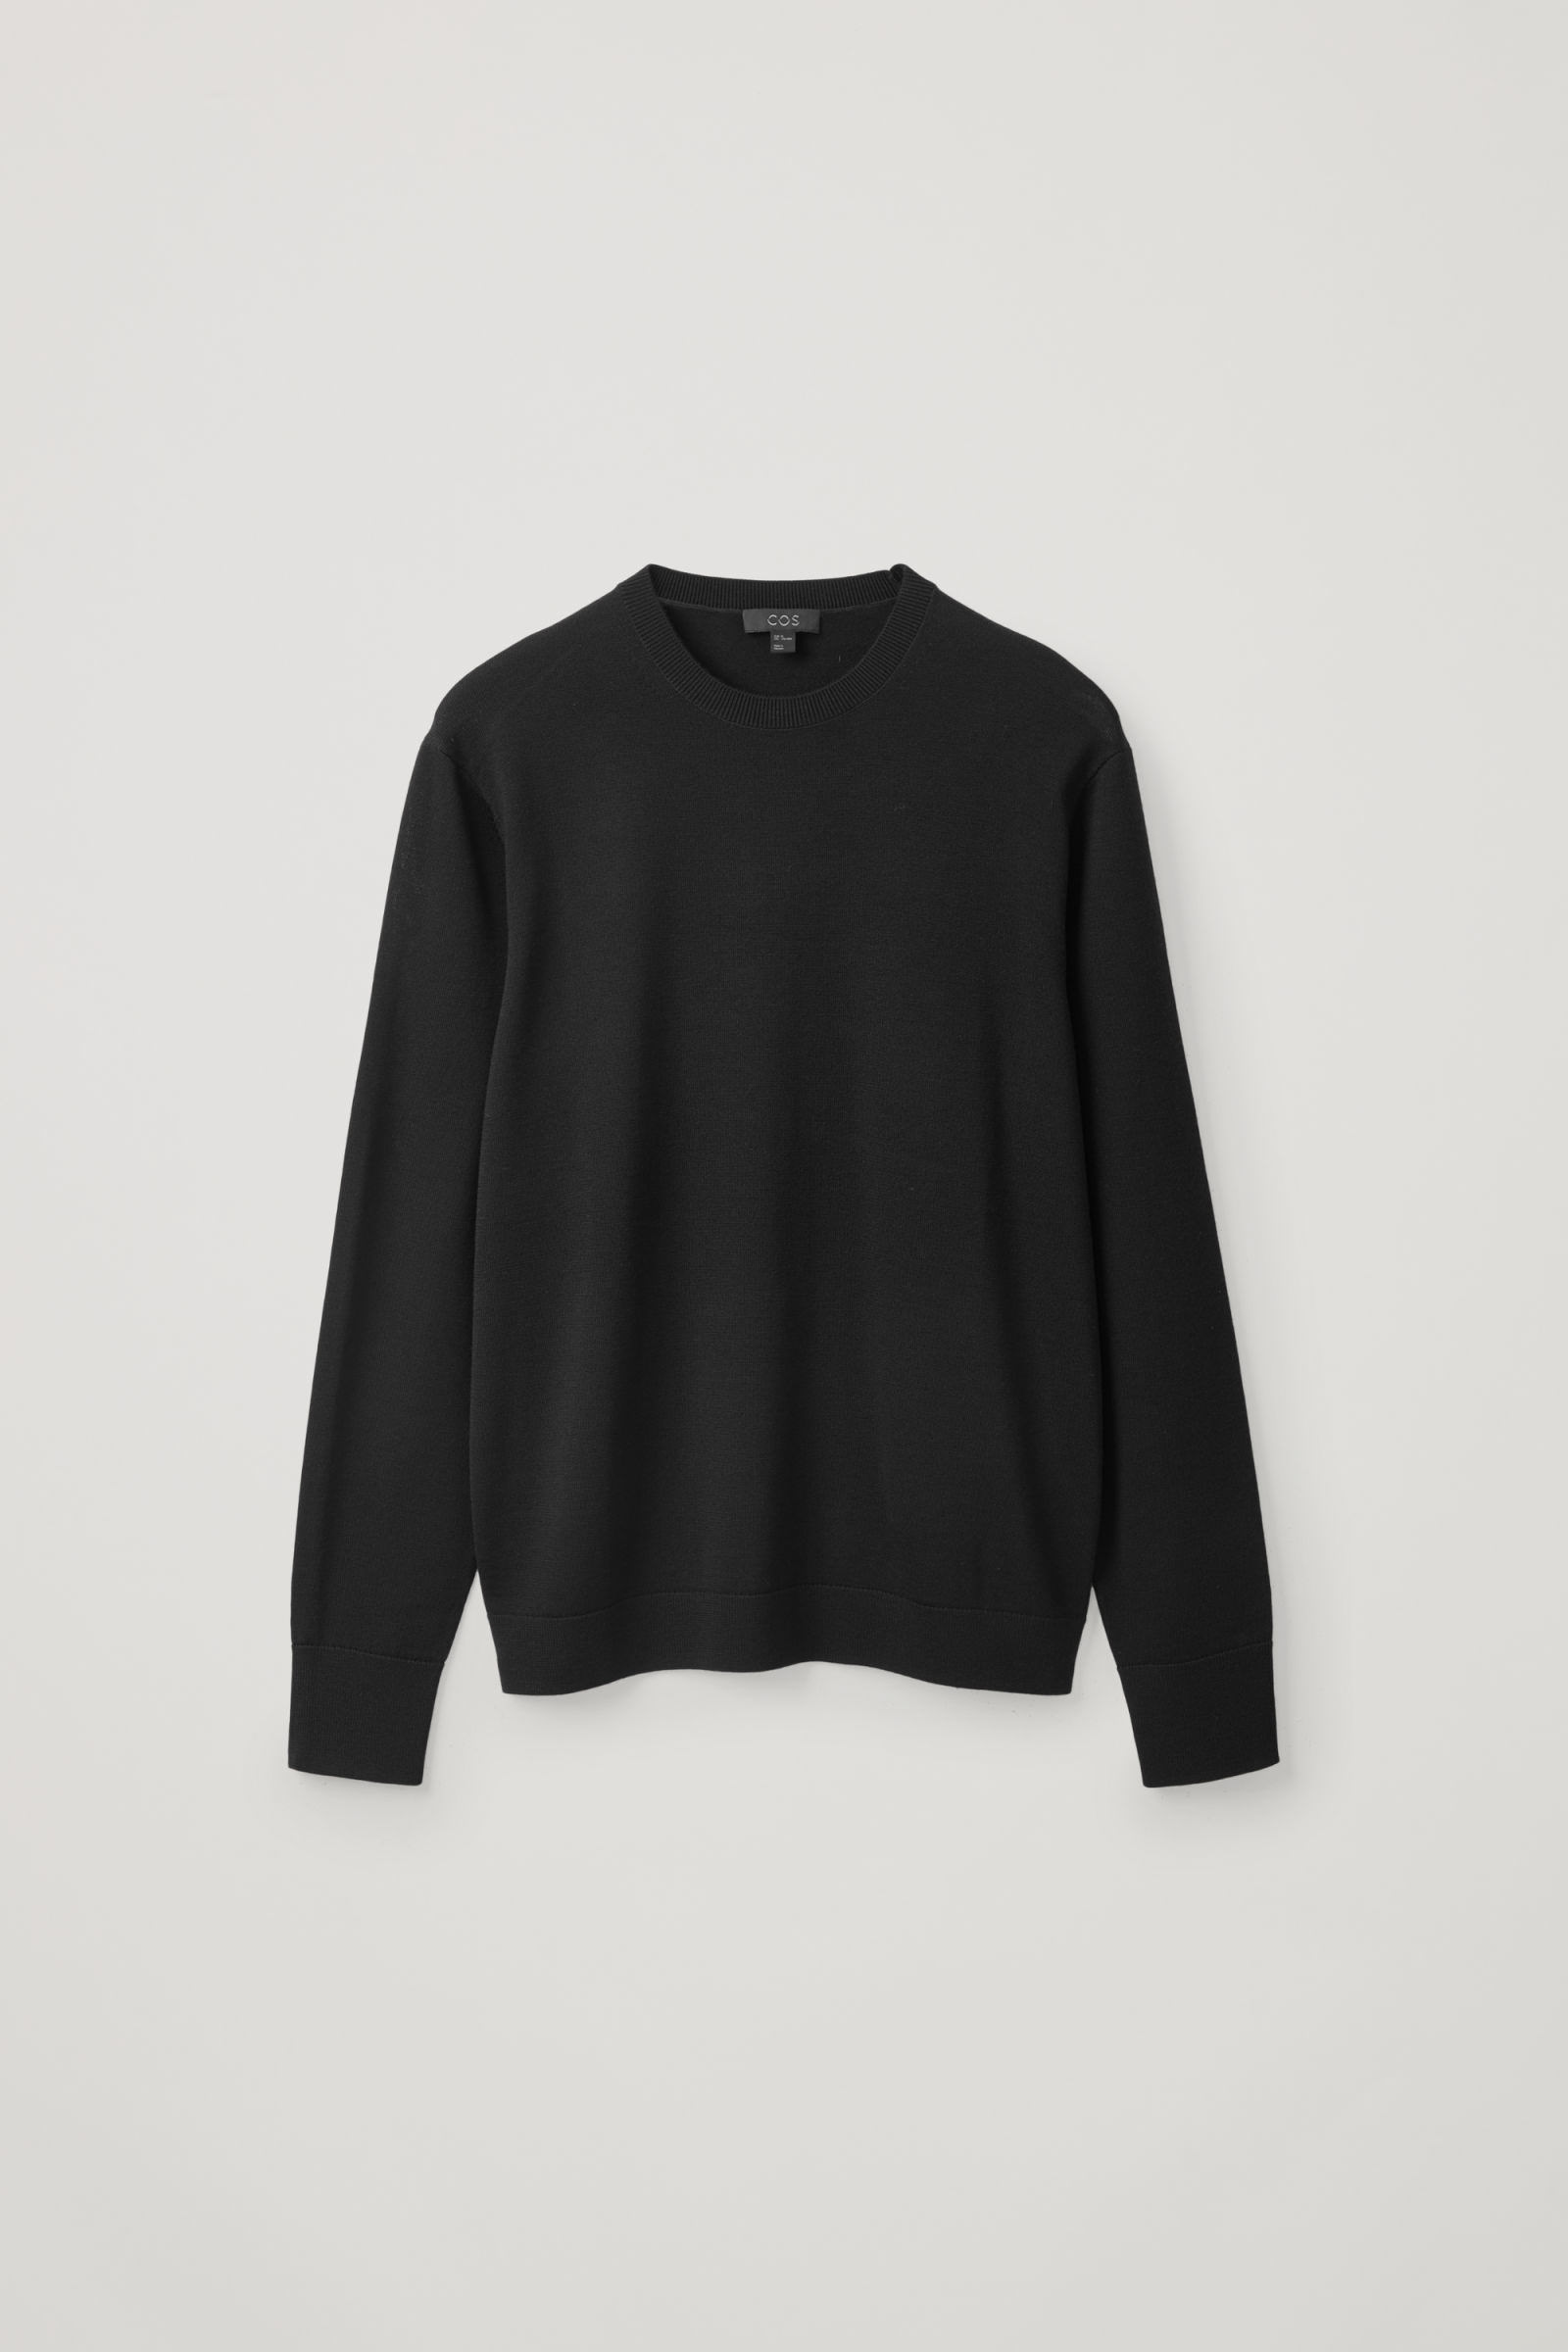 COS 메리노 크루넥 스웨터의 블랙컬러 Product입니다.